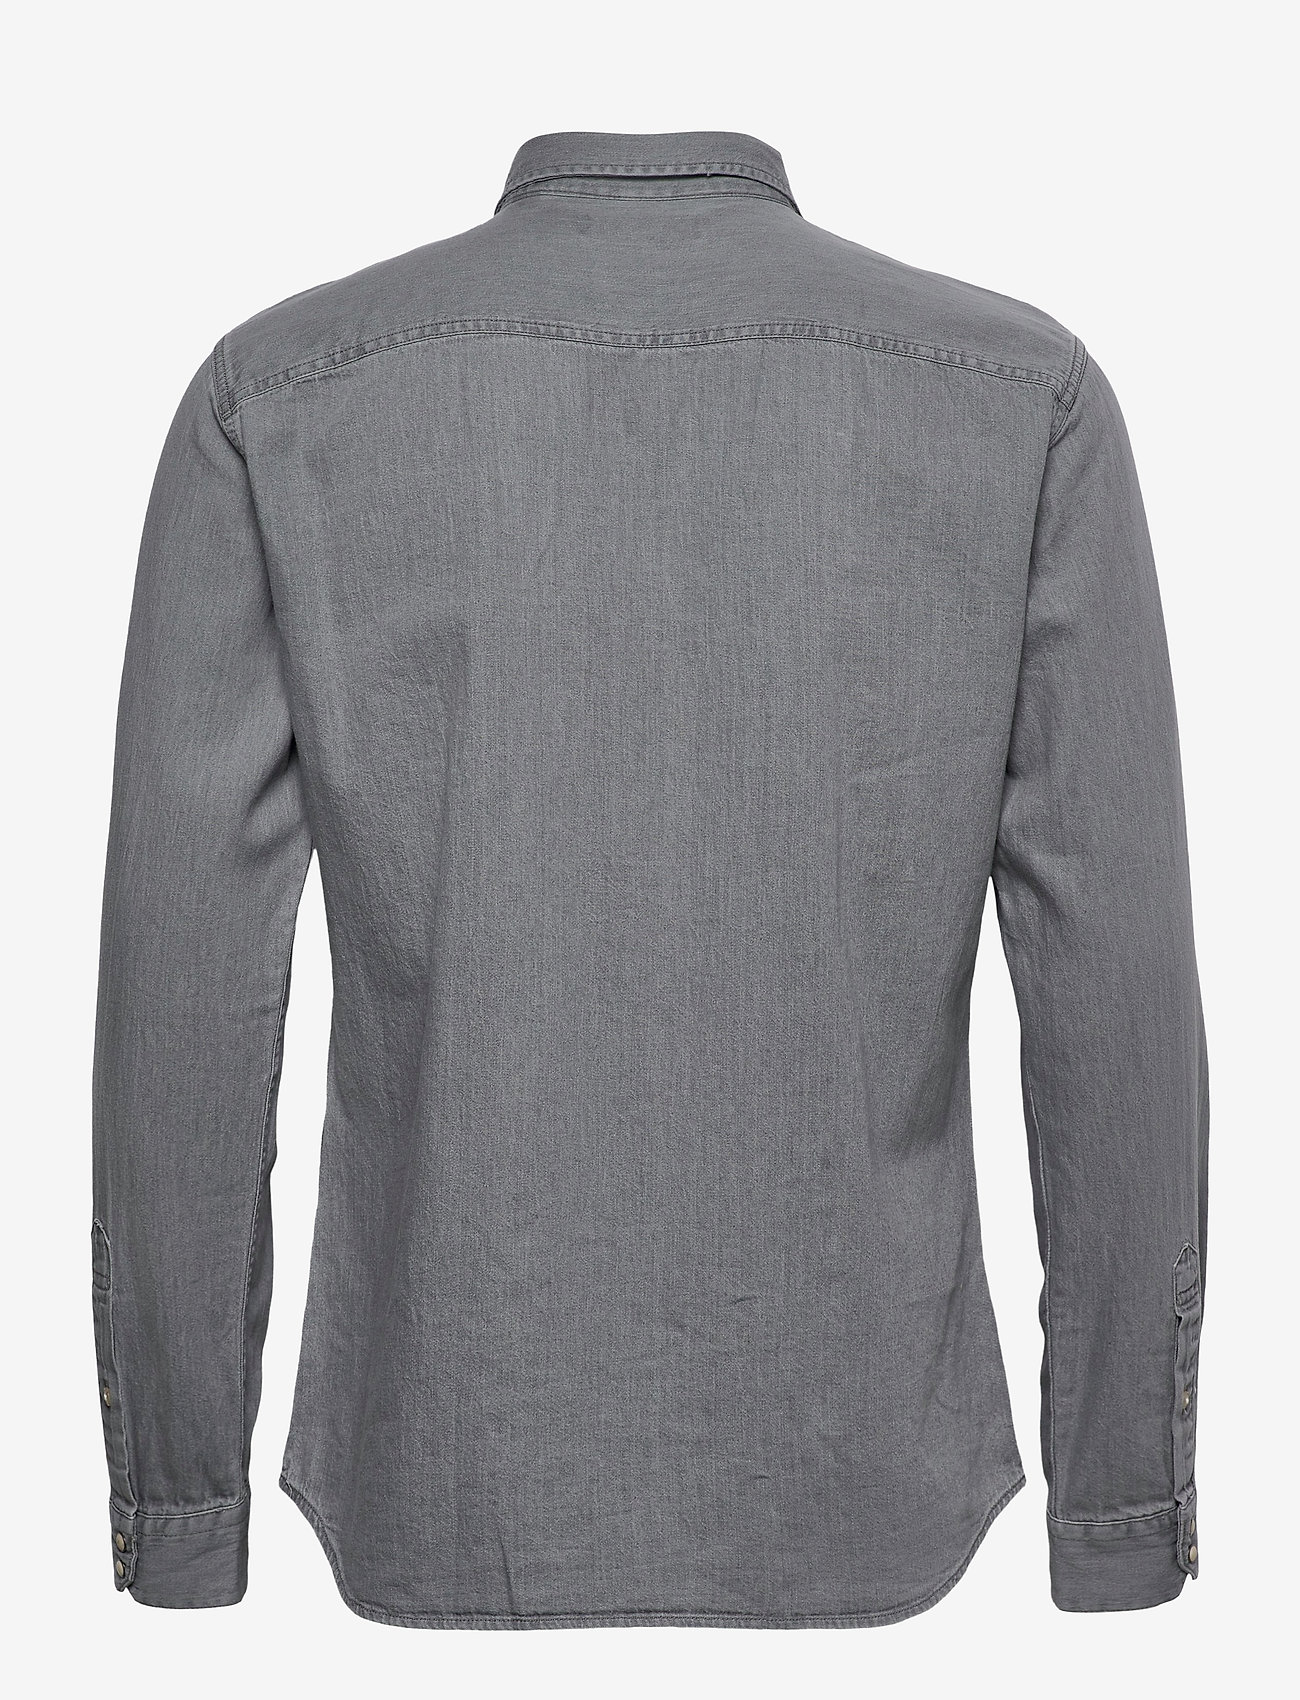 Jack & Jones - JJESHERIDAN SHIRT L/S - jeansskjortor - light grey denim - 1